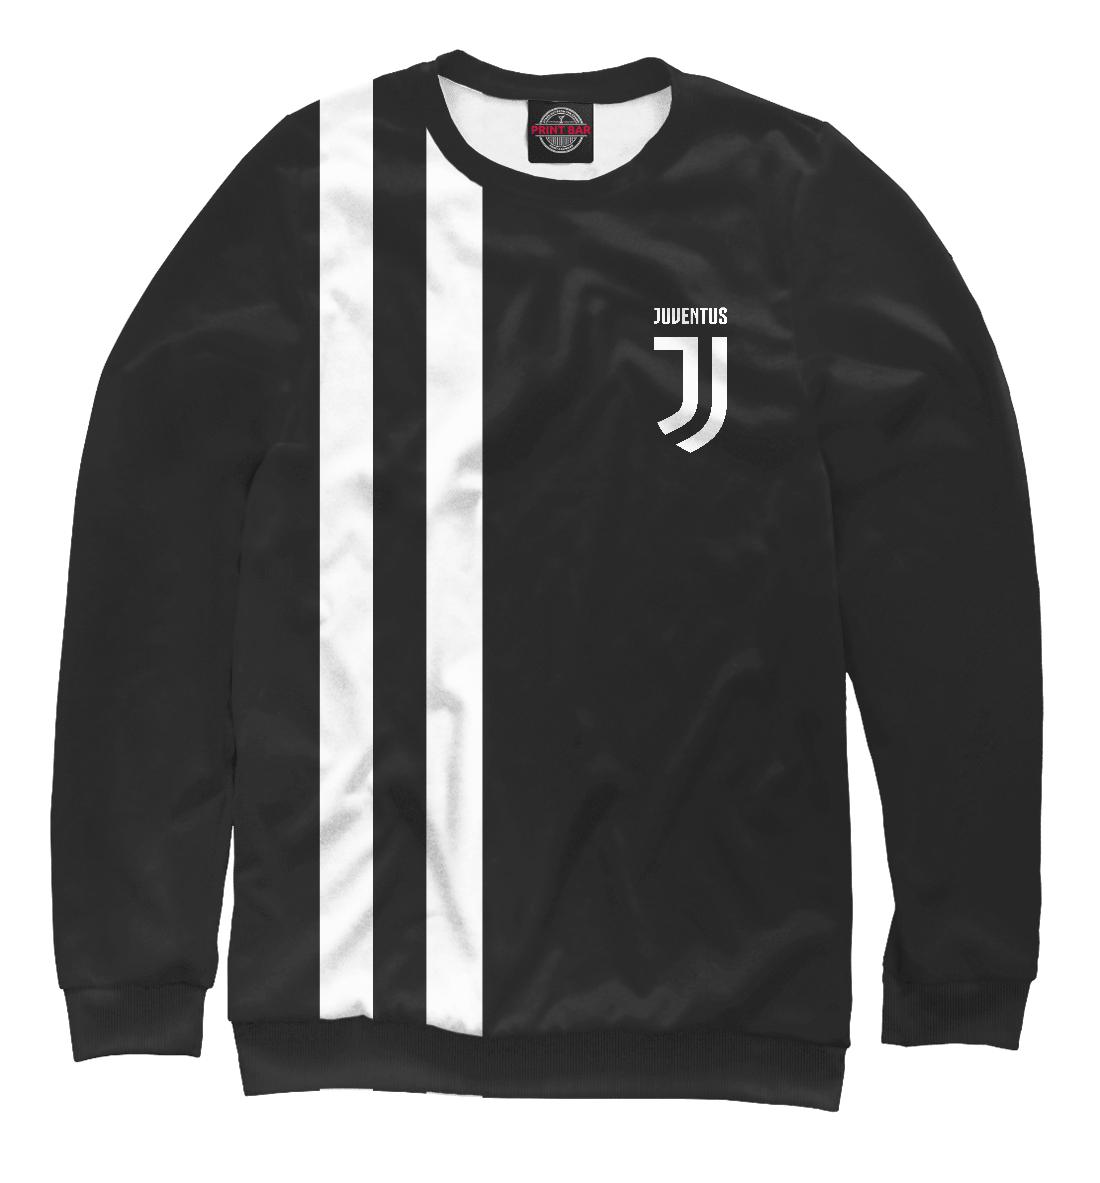 Купить Juventus Lines, Printbar, Свитшоты, JUV-167000-swi-1